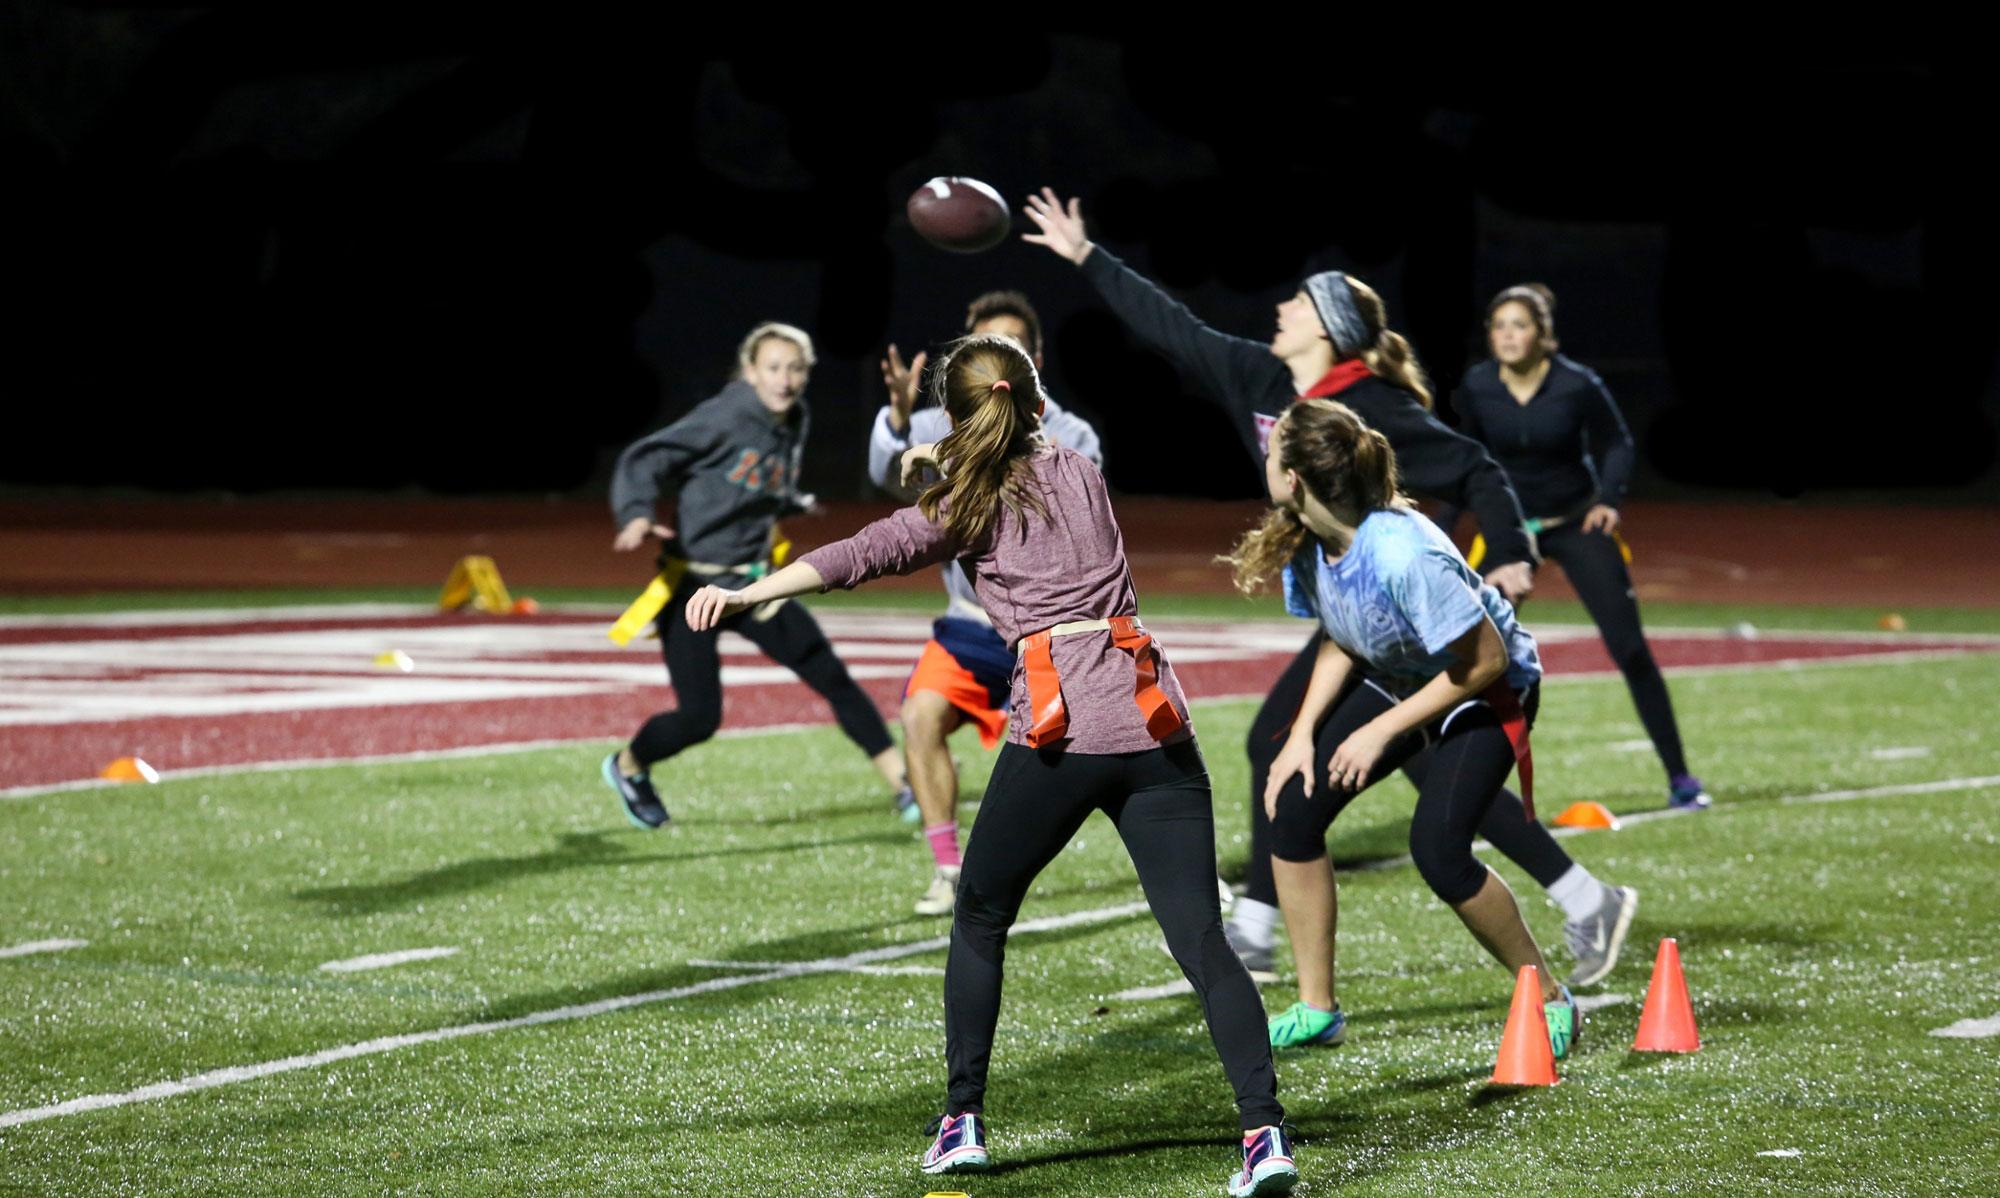 Campus Recreation Intramural Sports